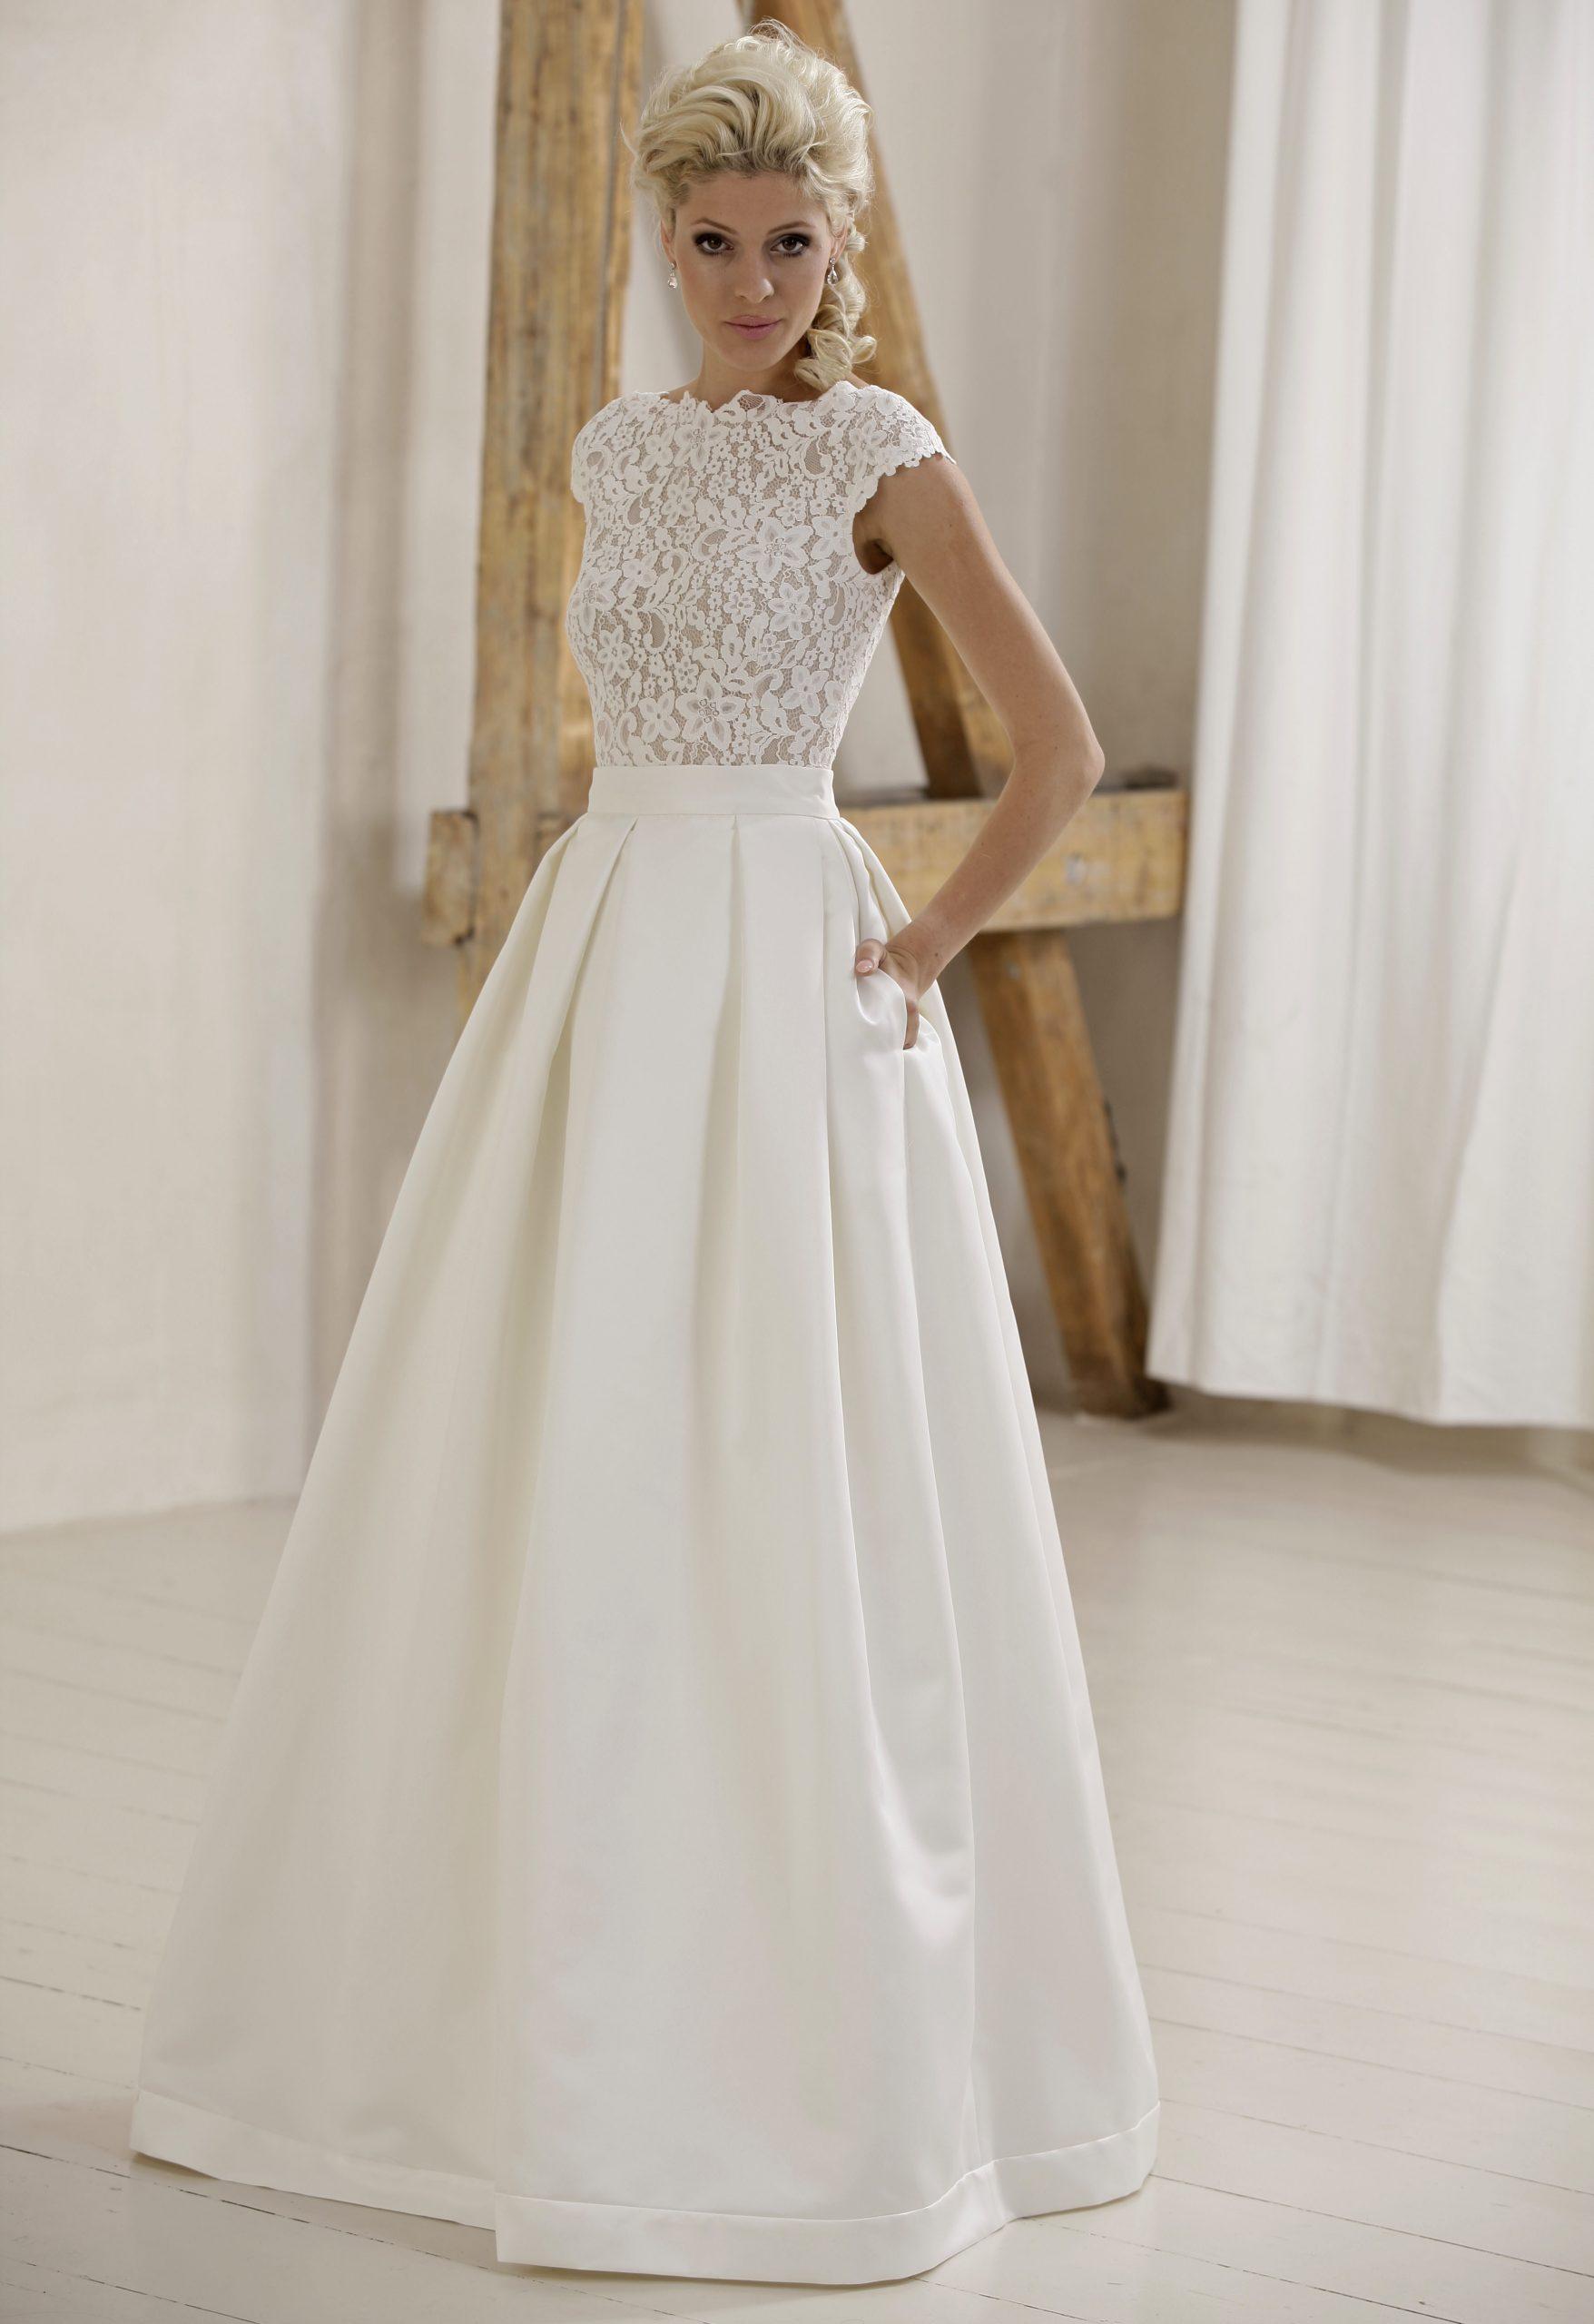 Modell Marta Mit Satin Skirt 735  Silk  Lace